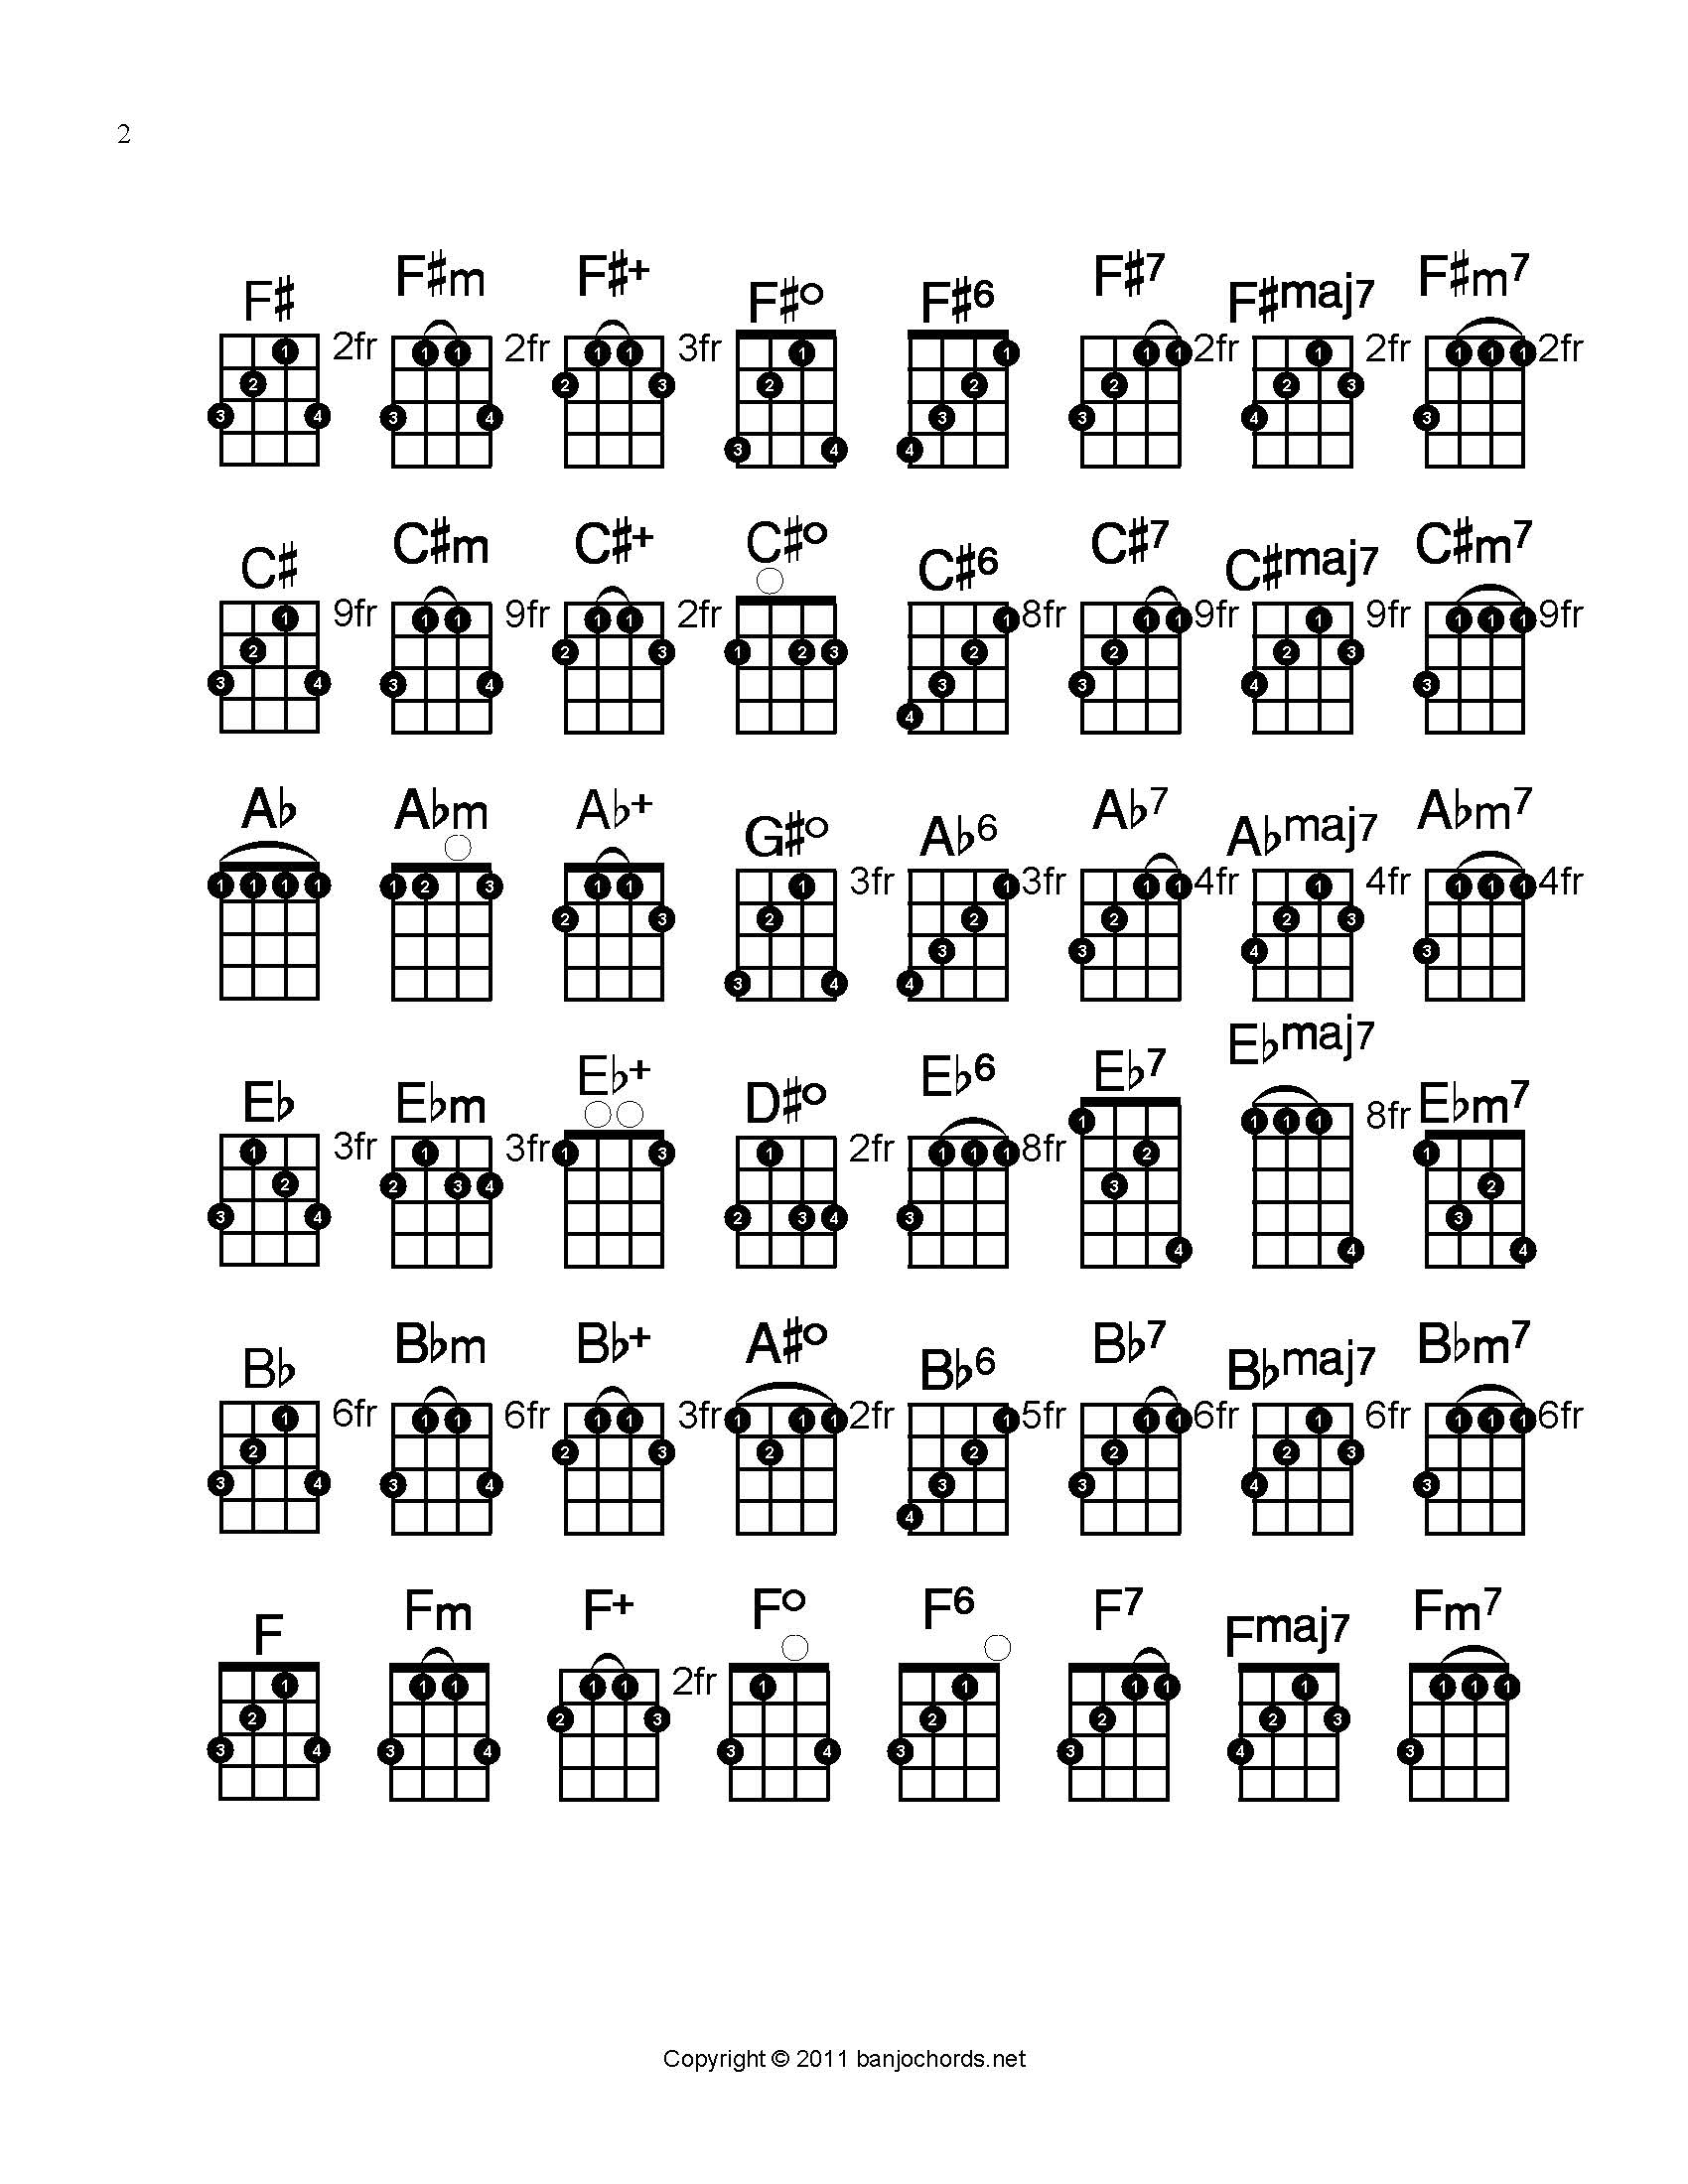 Banjo Chords Chart Ibovnathandedecker